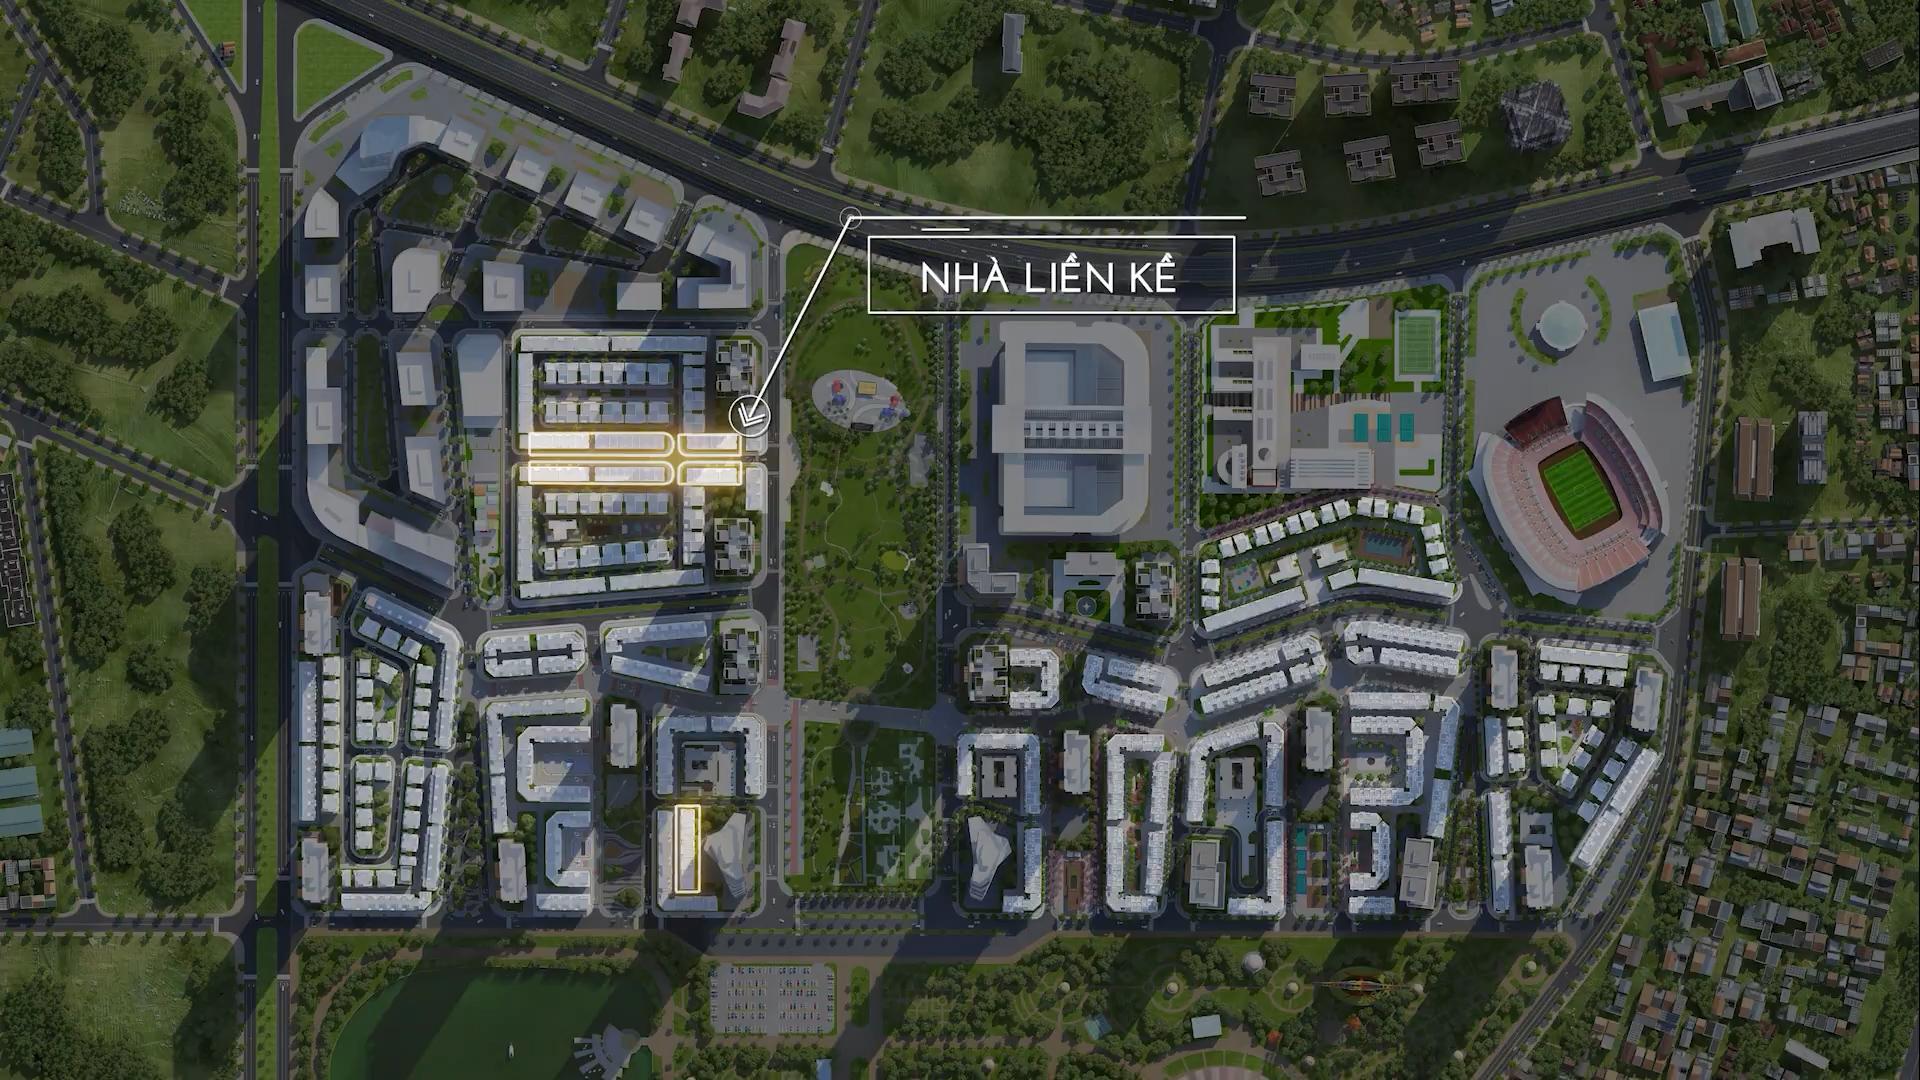 Nha lien ke the manor central park - Trang chủ